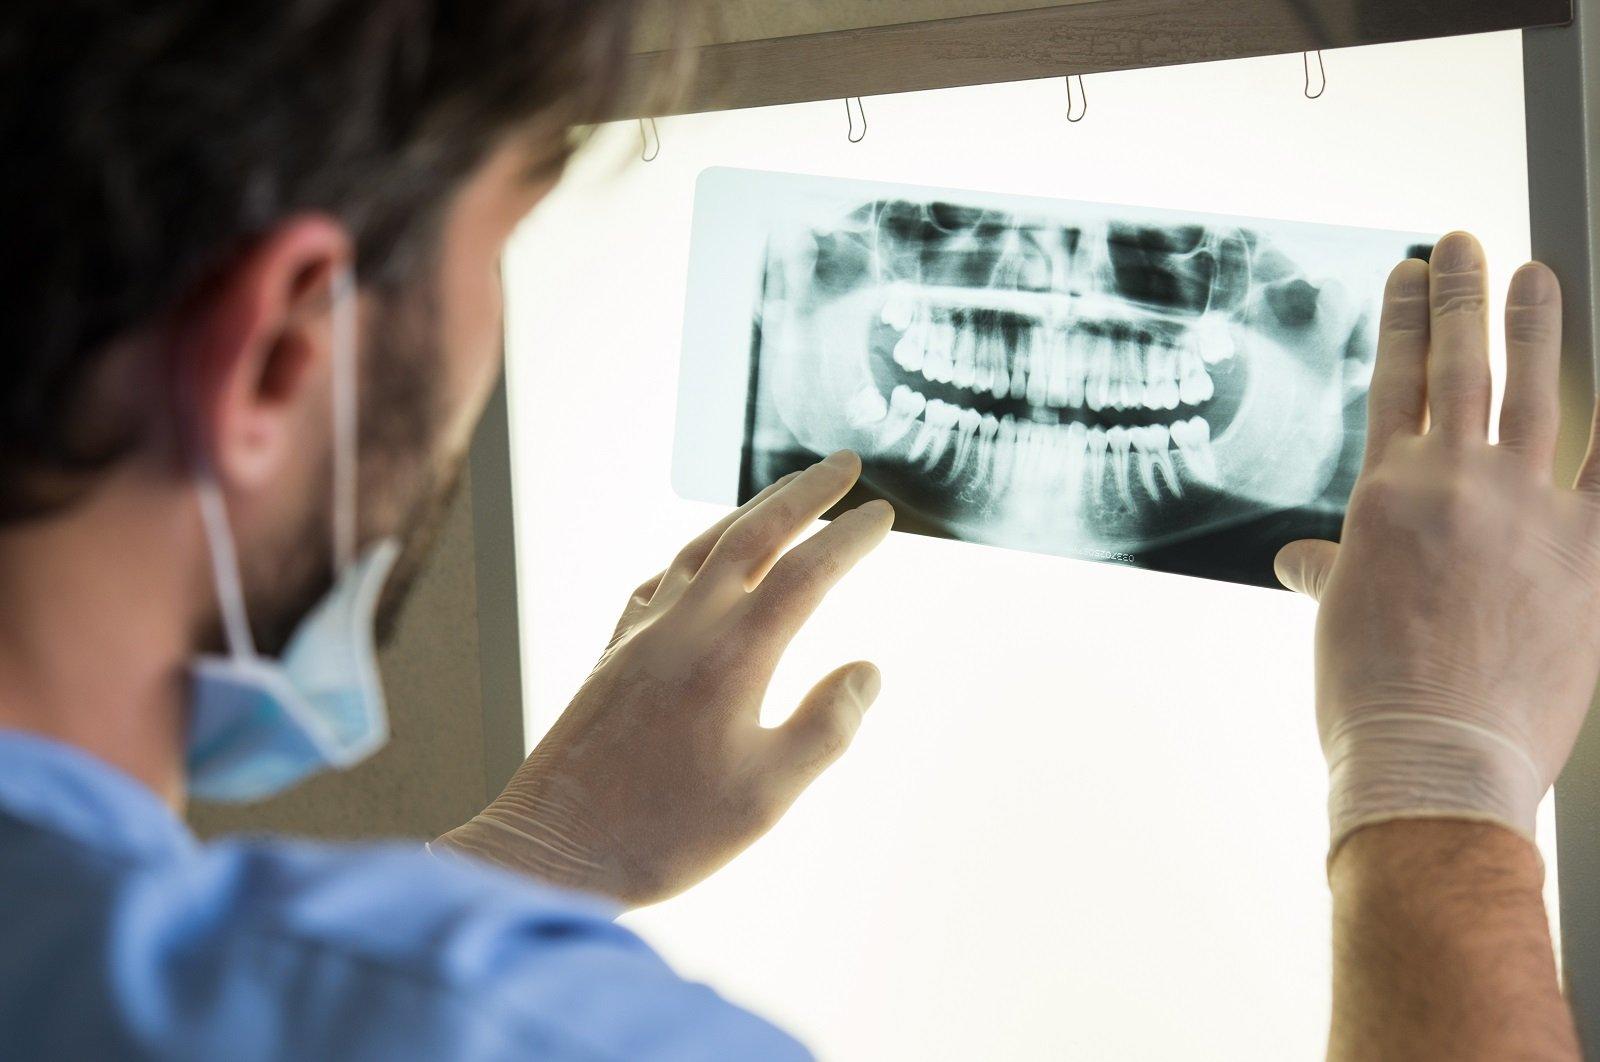 Dentista esamina radiografia dentale